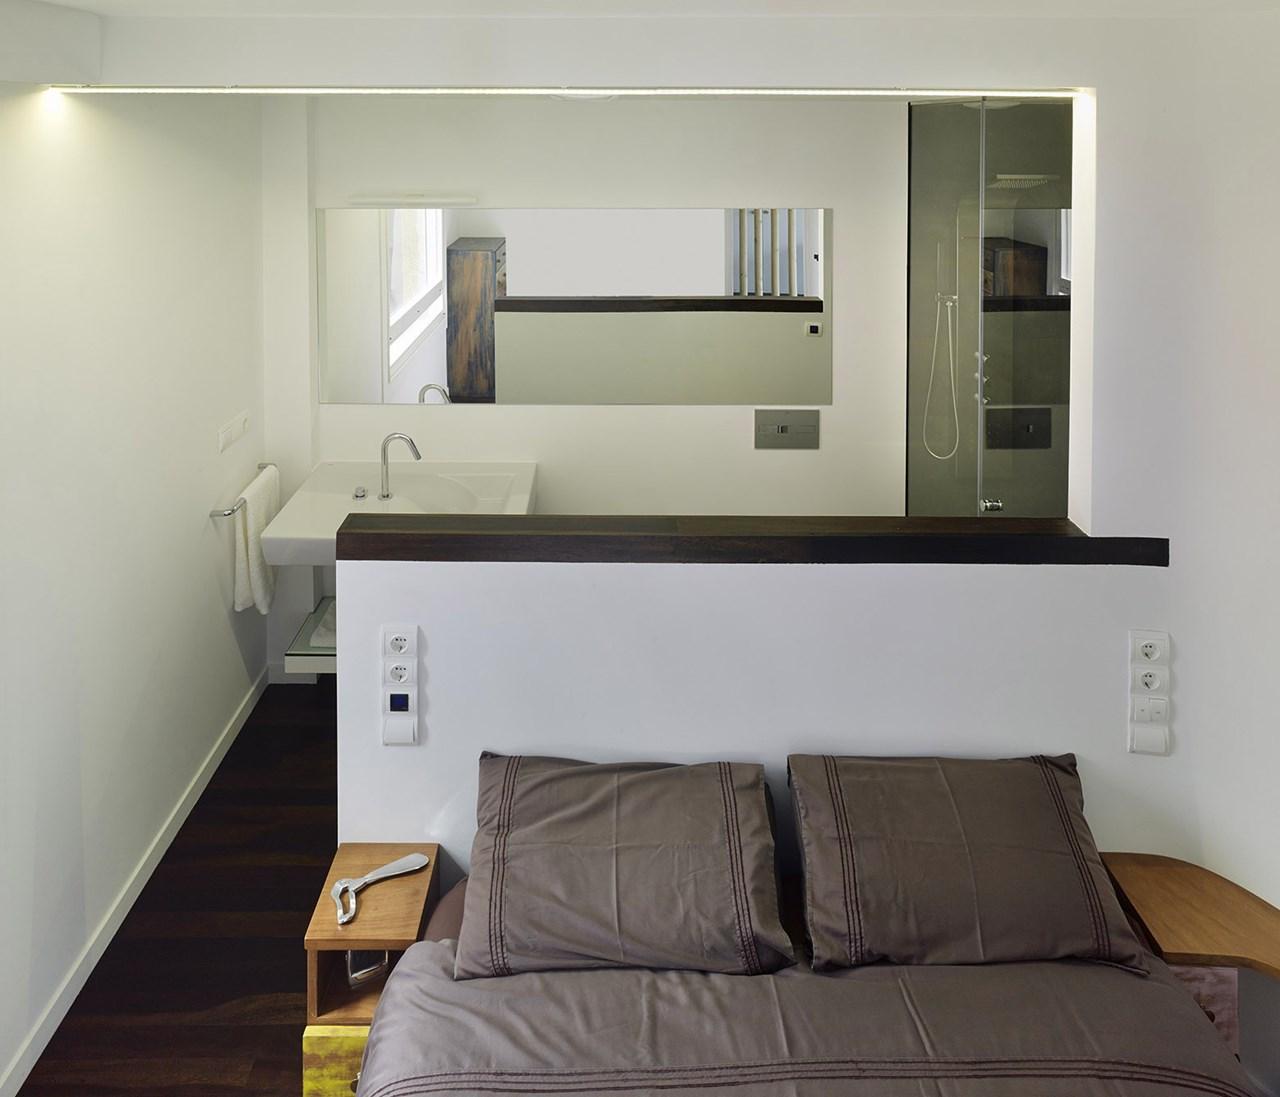 Duplex Apartment By Ameneiros Rey Hh Arquitectos In Spain